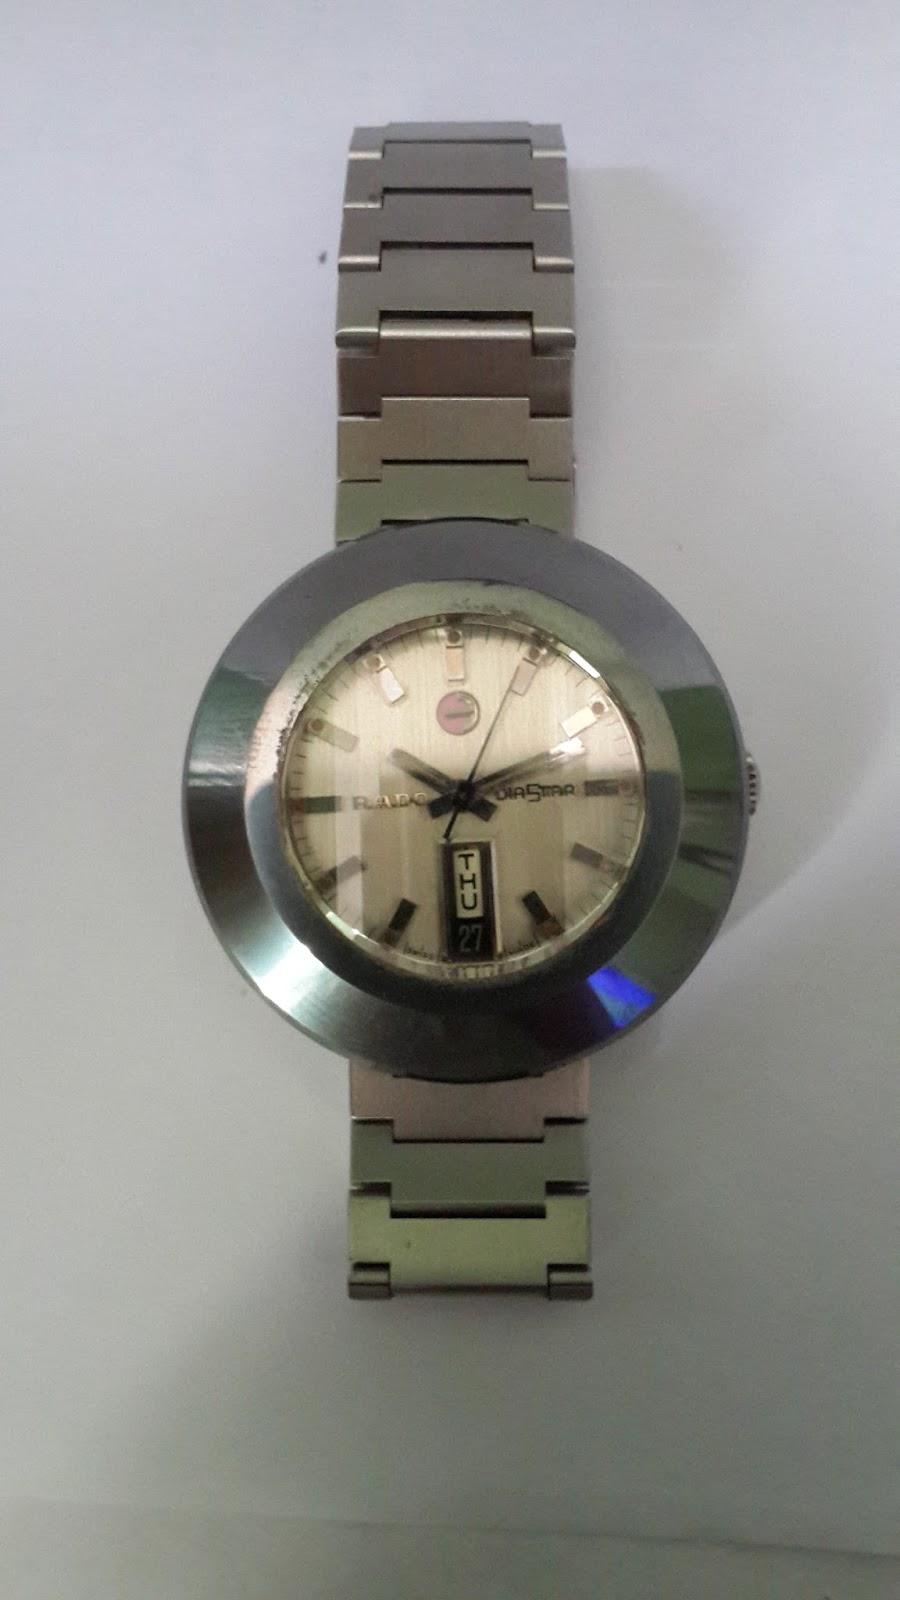 Rado diastar model 10602823